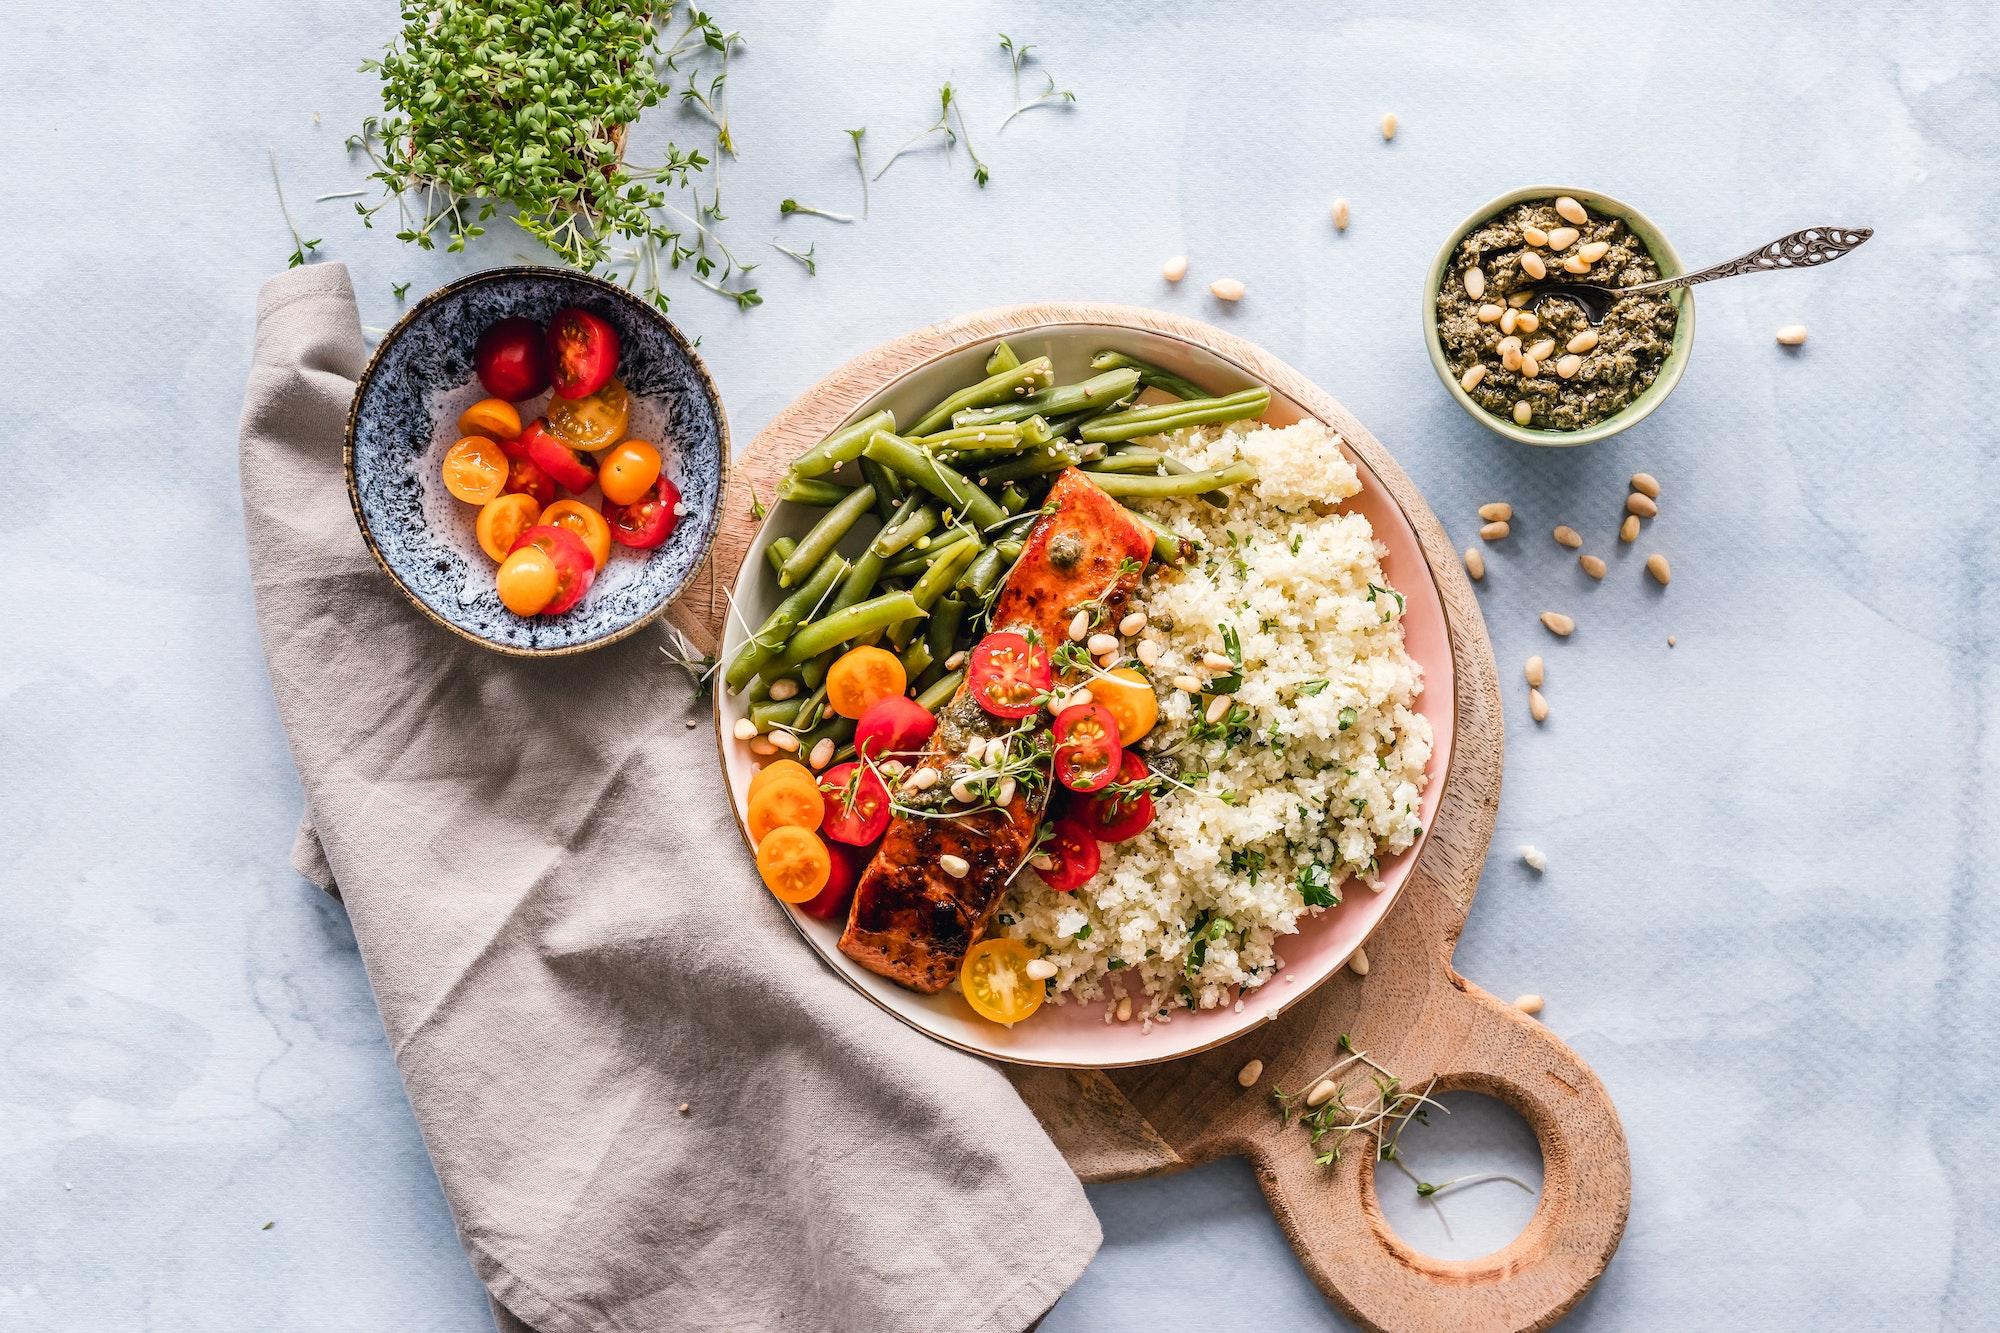 5 Basic Cooking Tricks You Should Know | Cooking Food & Drink | Elle Blonde Luxury Lifestyle Destination Blog